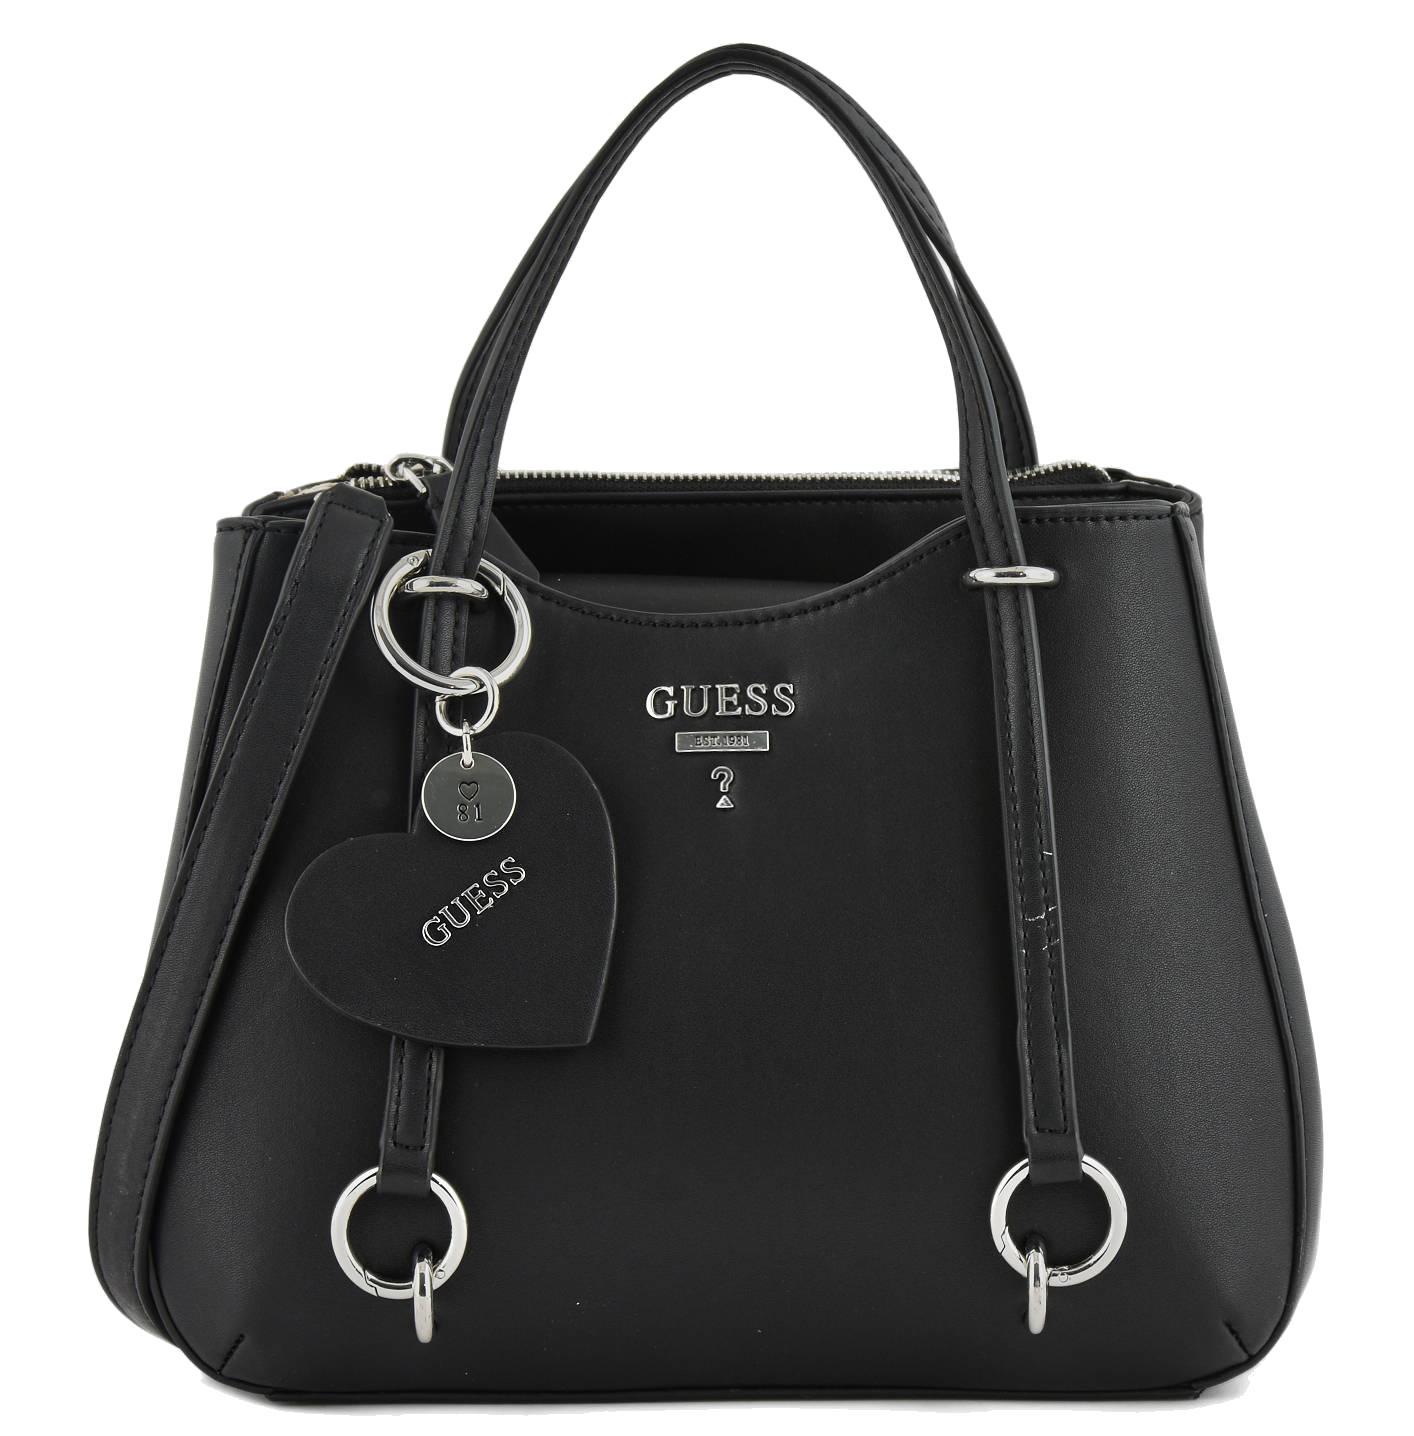 5582b580dd Guess leanne small handbag shoulder bag with shoulder strap black jpg  1414x1436 Small guess handbags